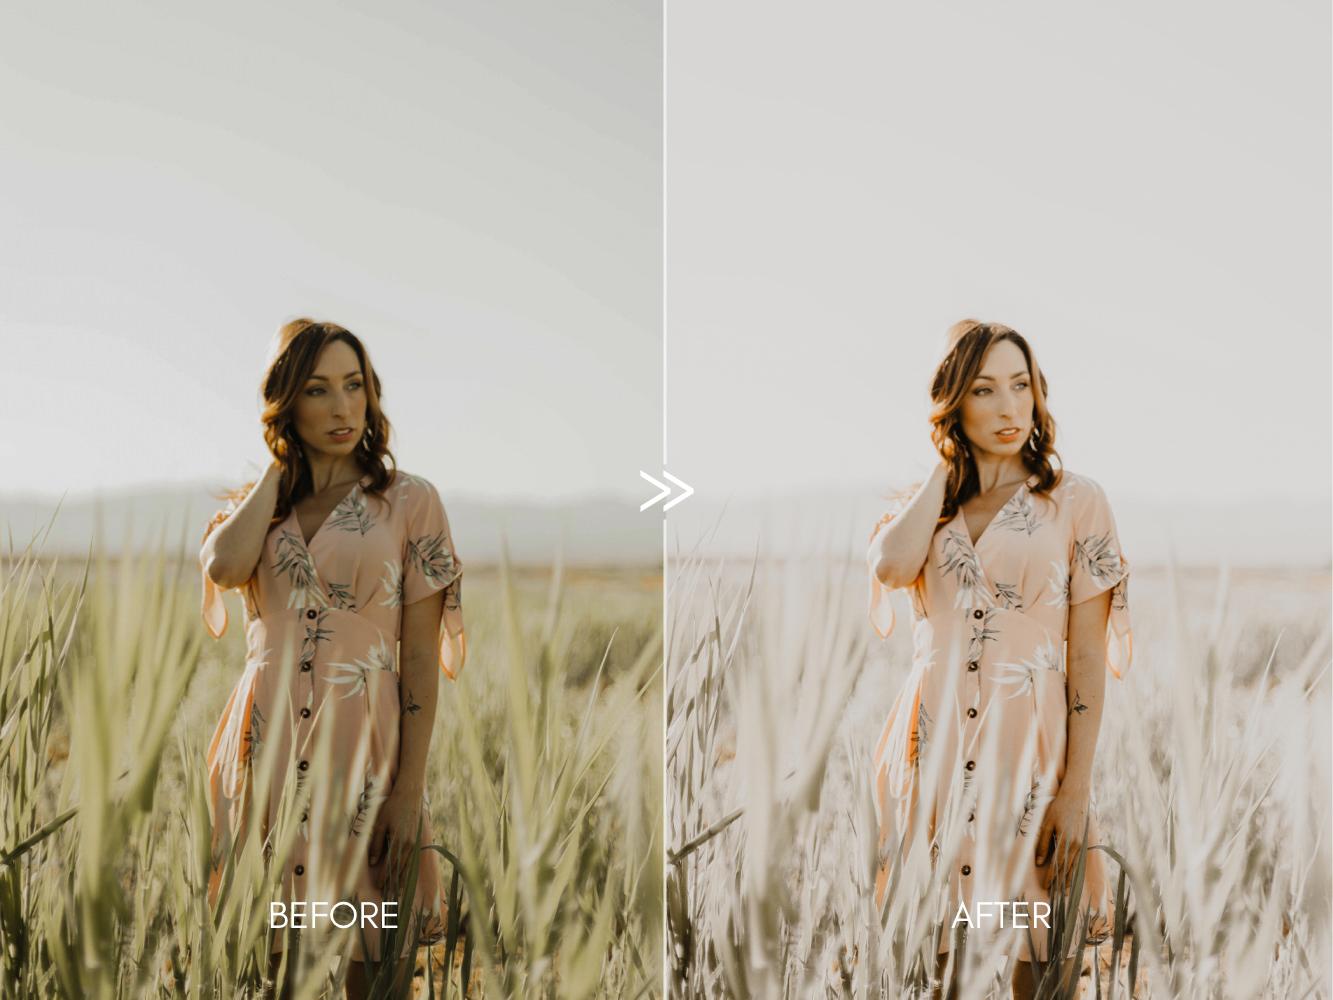 THE LIGHT & AIRY BUNDLE - Natural Clean Bright Lightroom Presets for Desktop + Mobile - creamy portraits presets 3 -